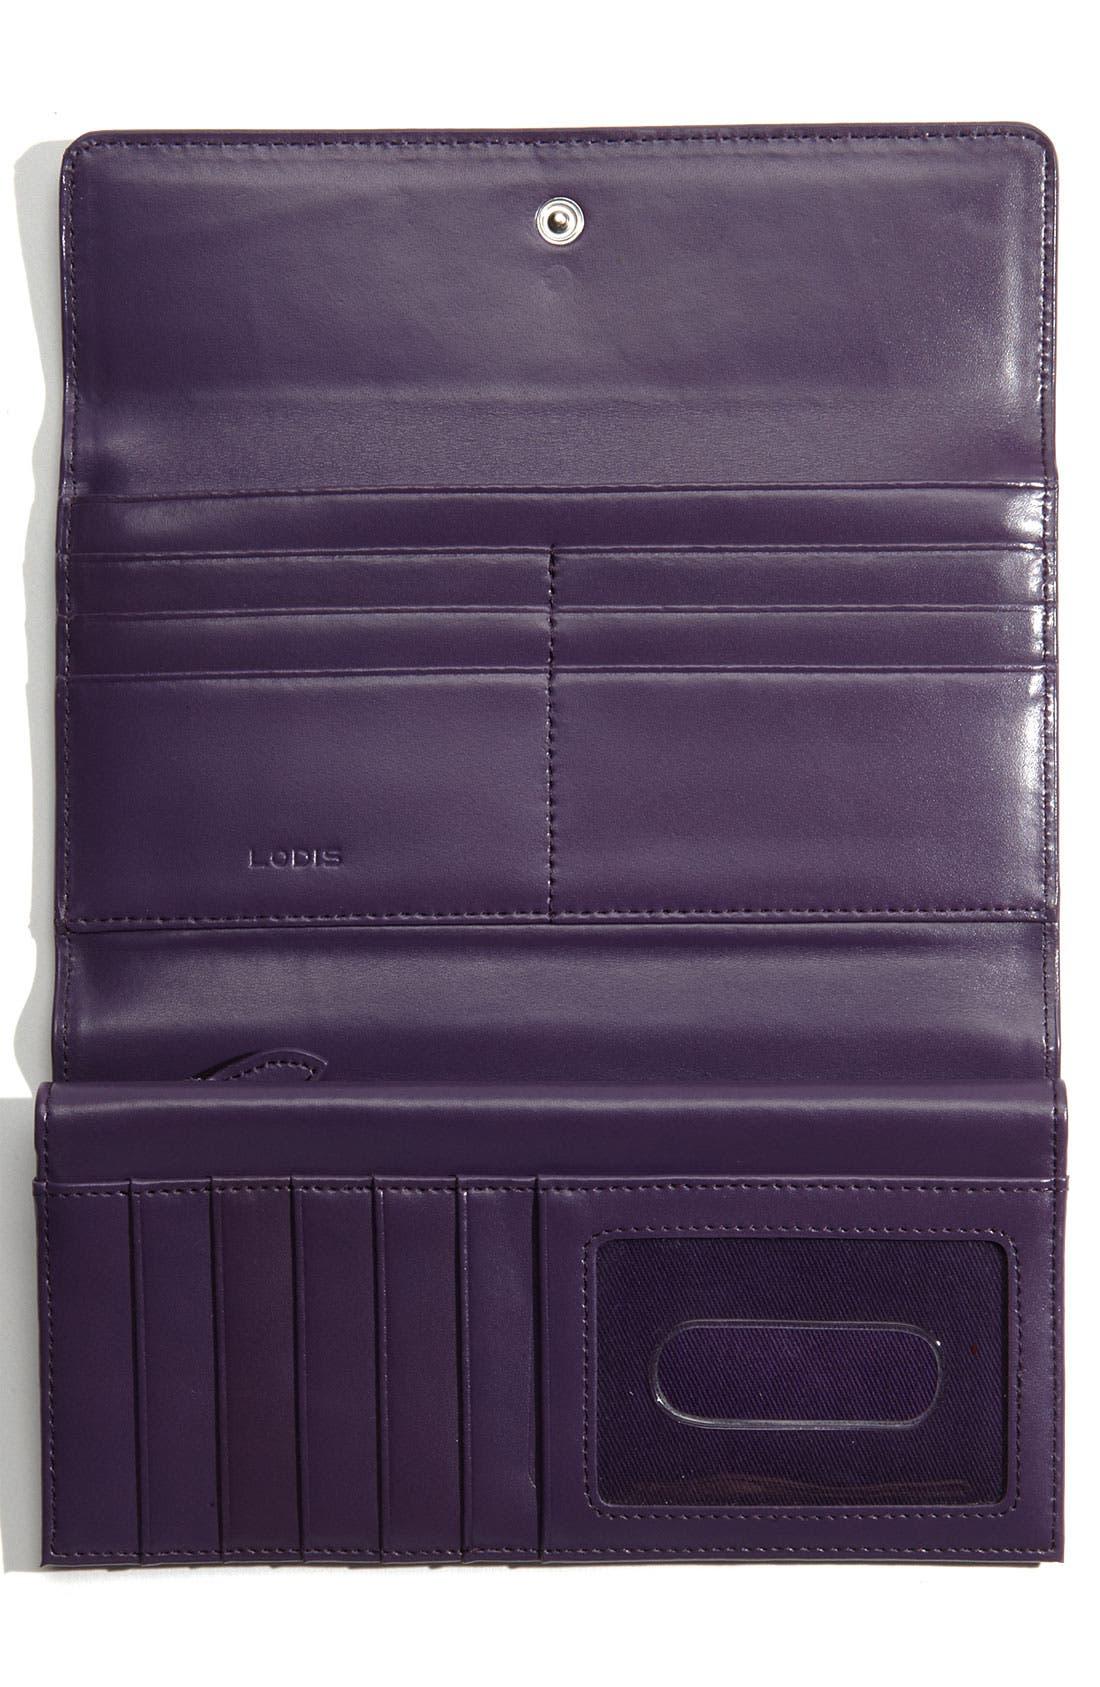 Lodis 'Audrey' Checkbook Clutch Wallet,                             Alternate thumbnail 2, color,                             035